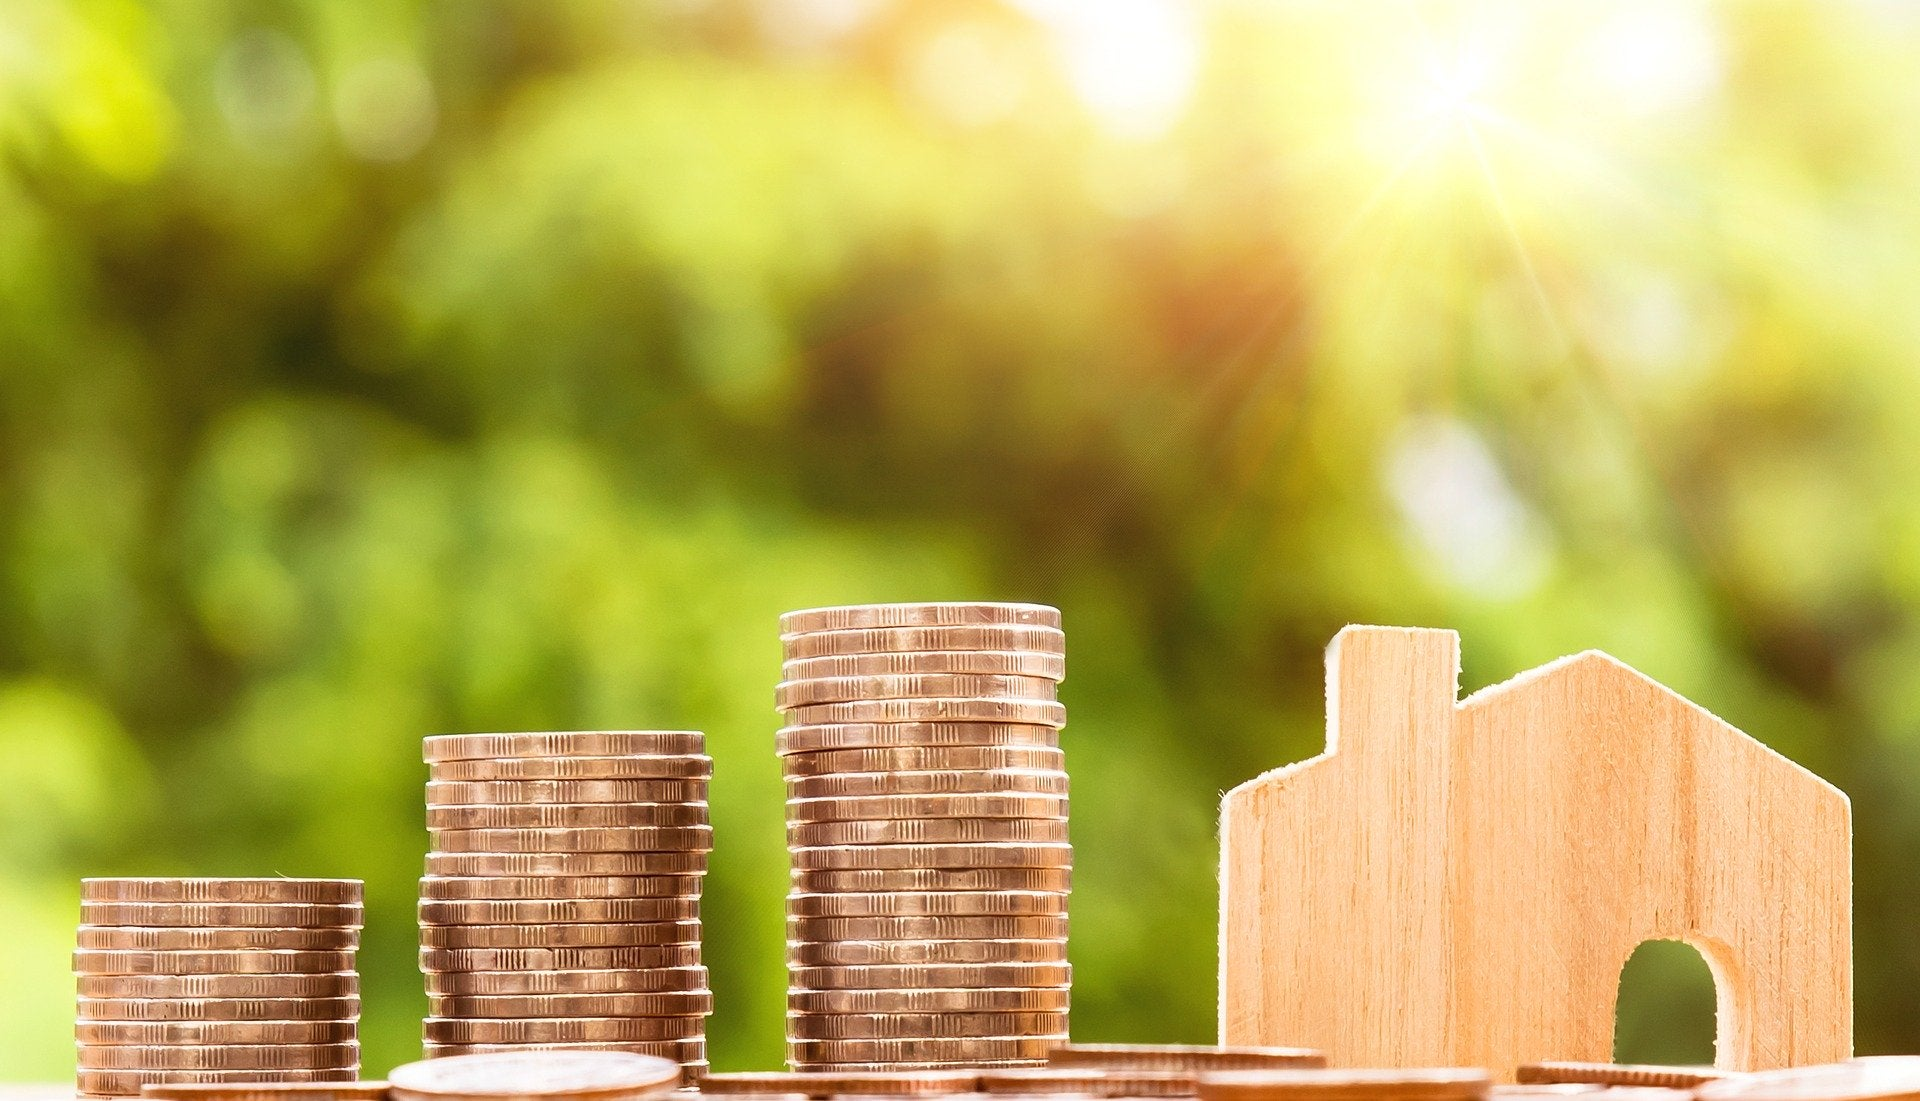 Dinero. Pixabay. annca. Pixabay License.